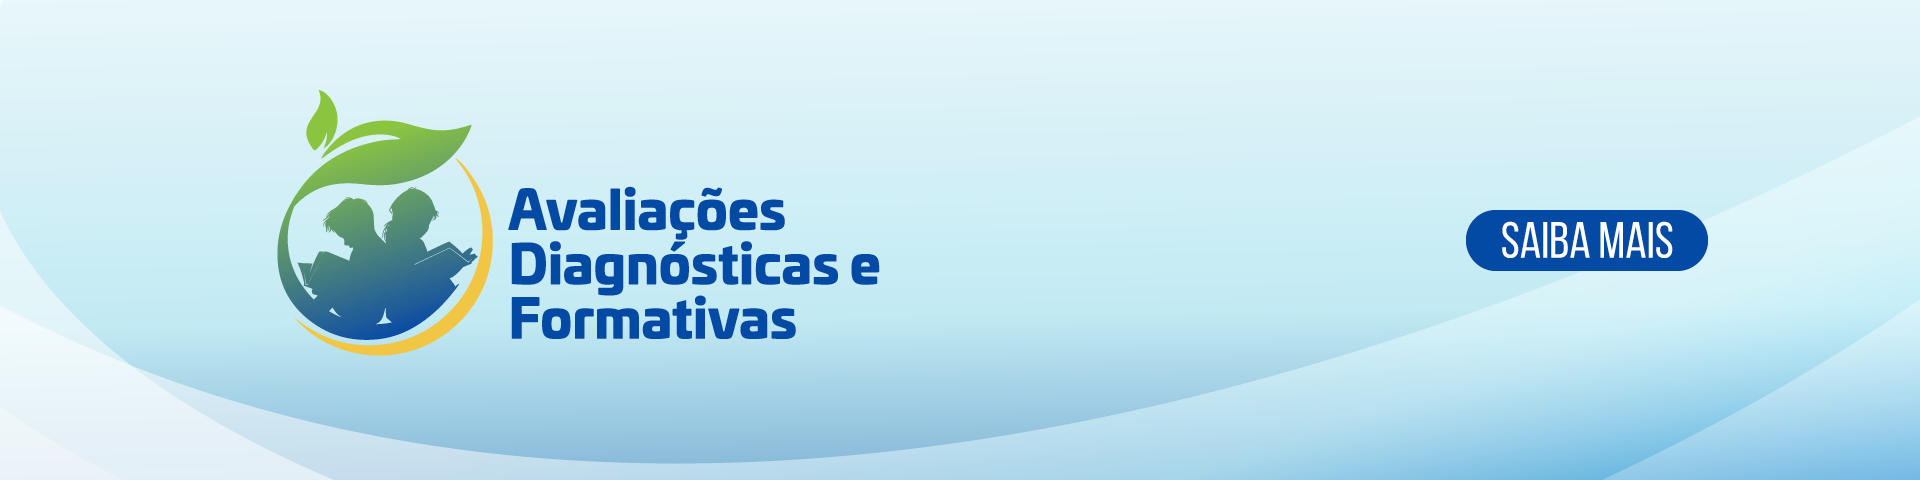 Avaliacoes_Diagnosticas_1920x480.png